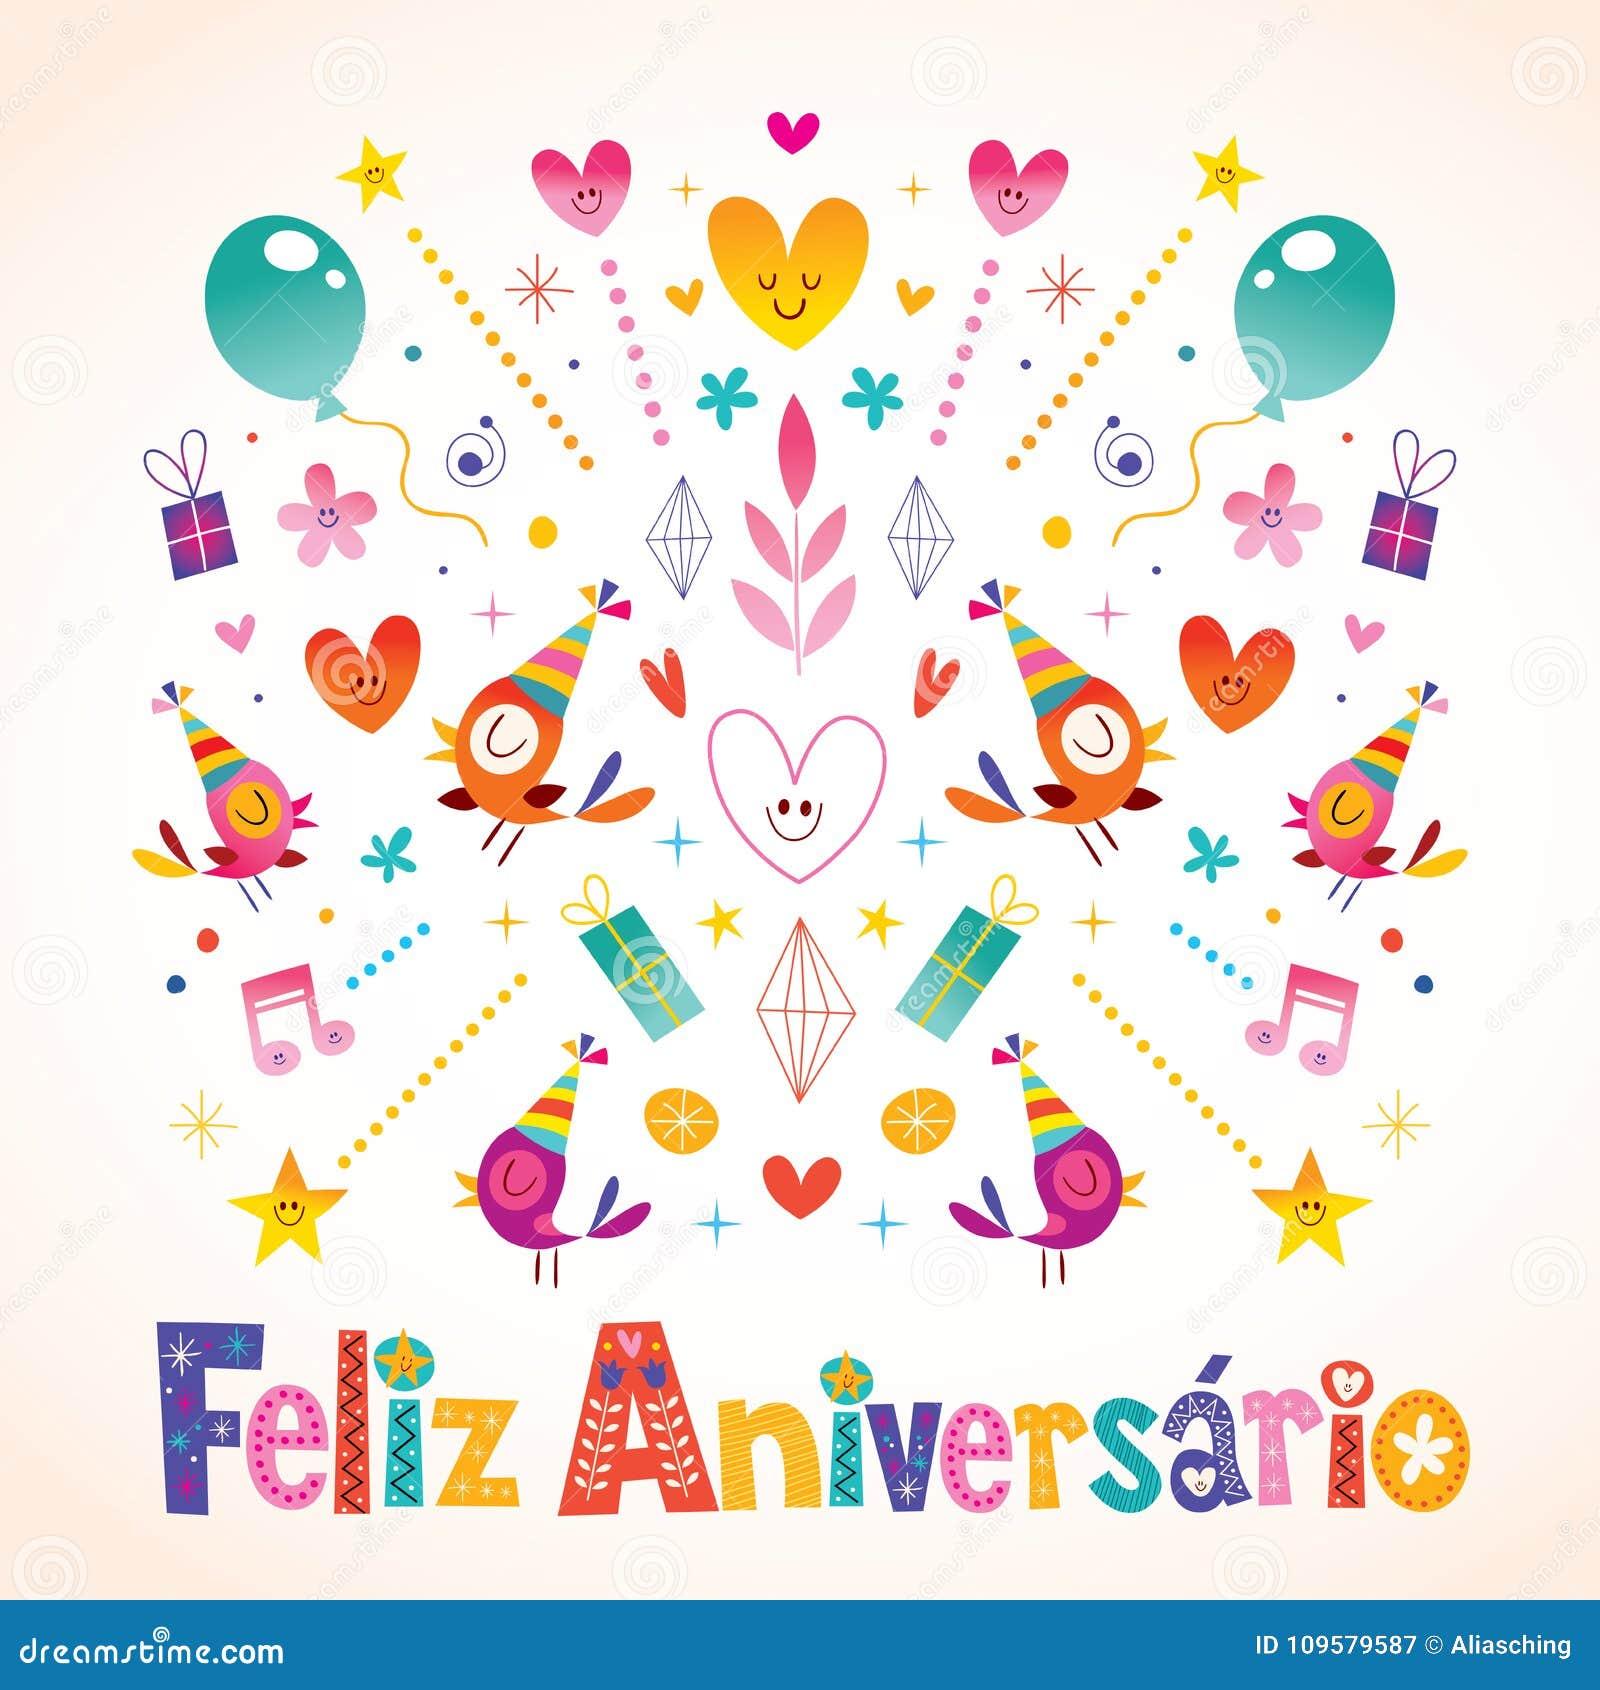 Feliz aniversario brazilian portuguese happy birthday stock vector feliz aniversario brazilian portuguese happy birthday greeting card m4hsunfo